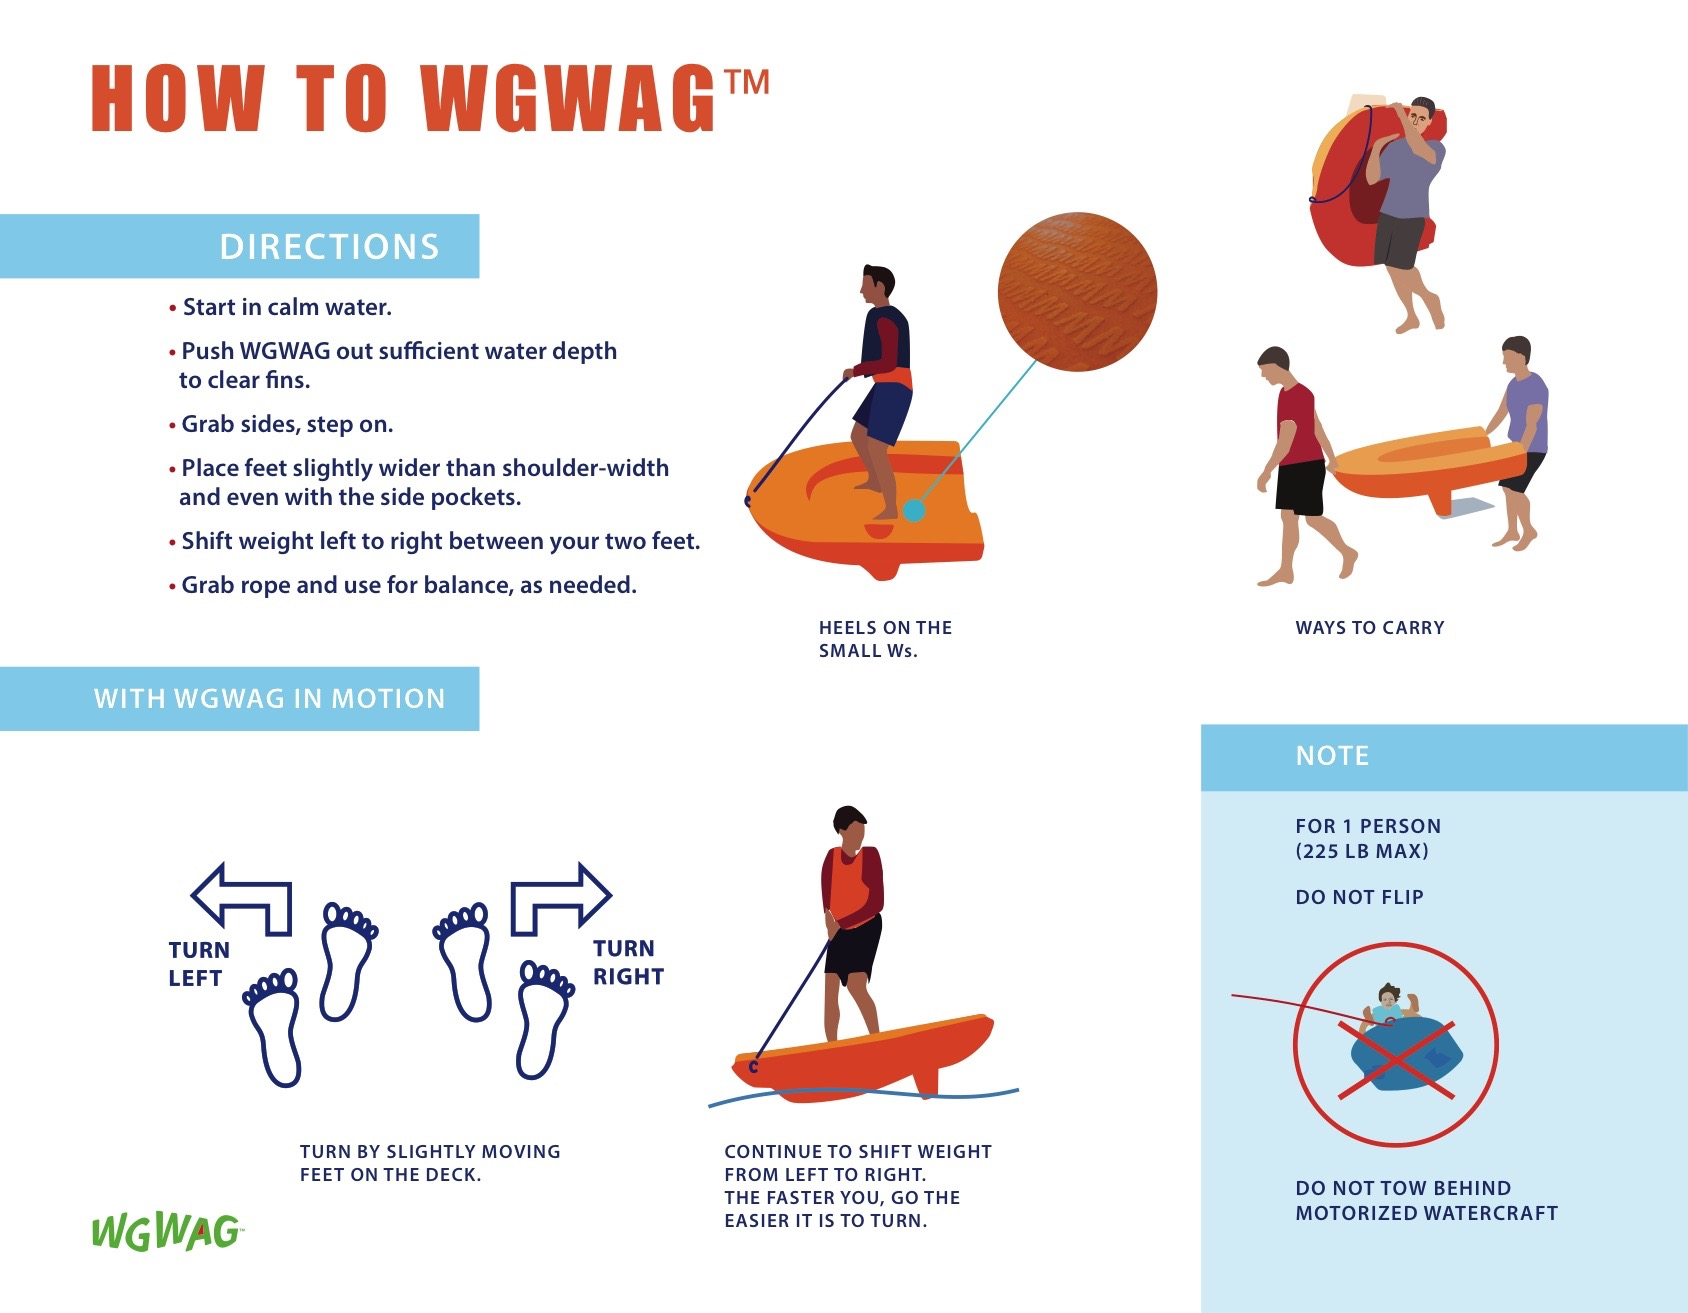 wgwag-how.jpg